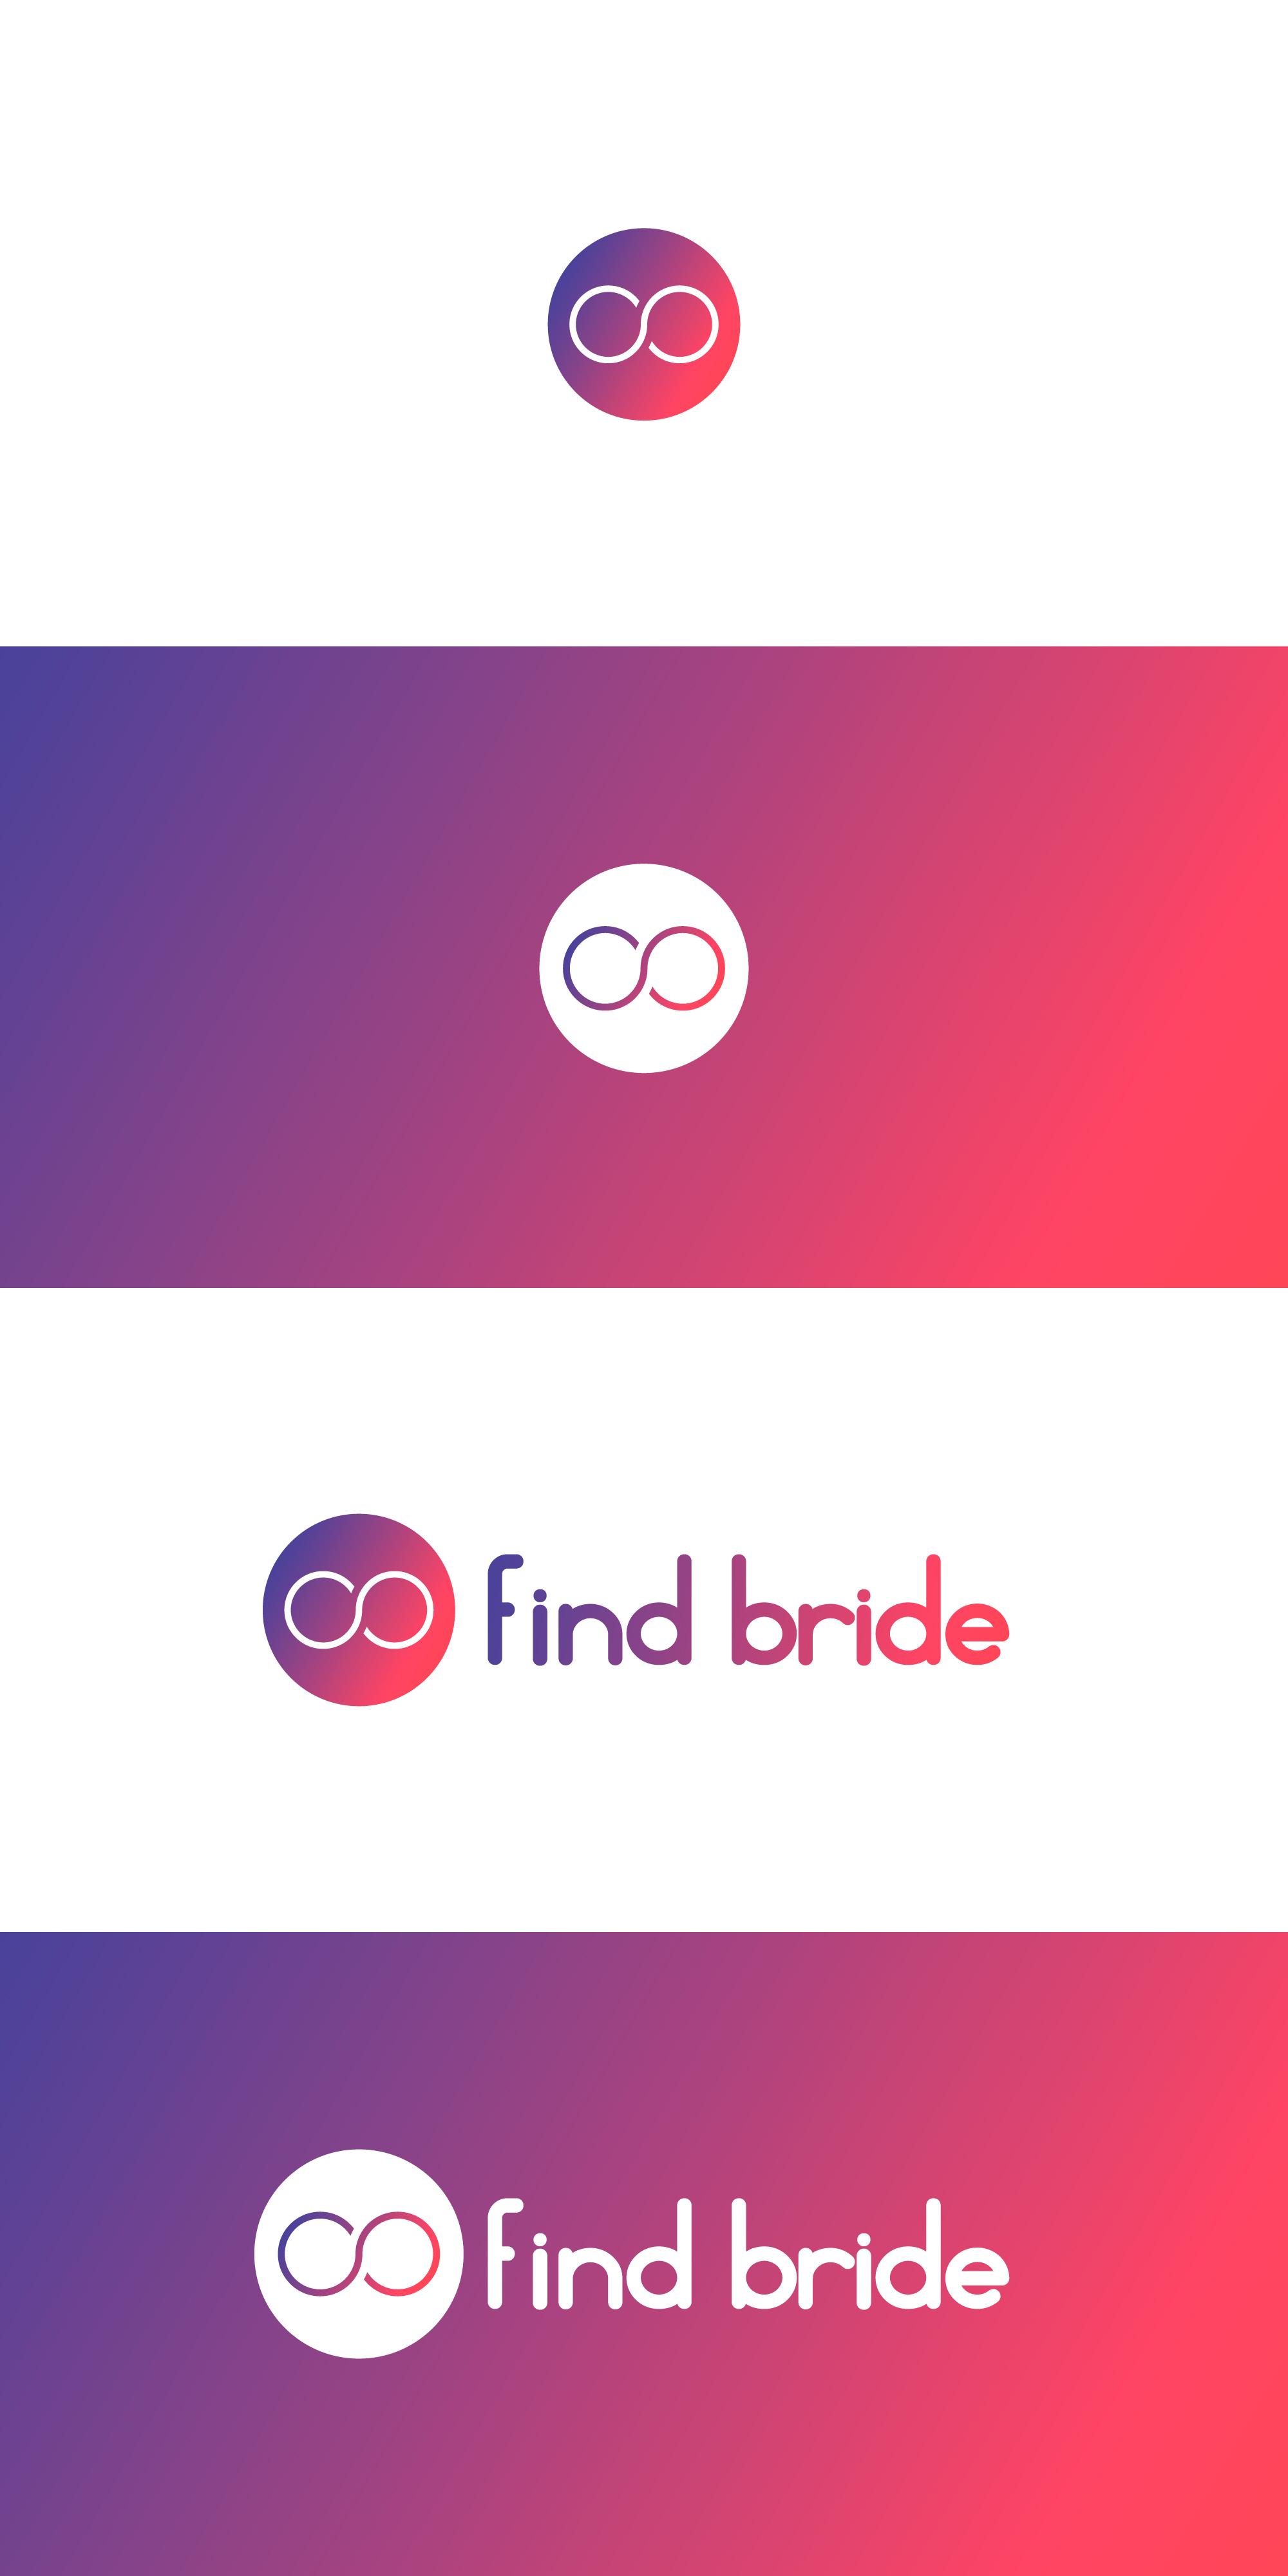 Нарисовать логотип сайта знакомств фото f_0705acdf74a0a4c3.jpg